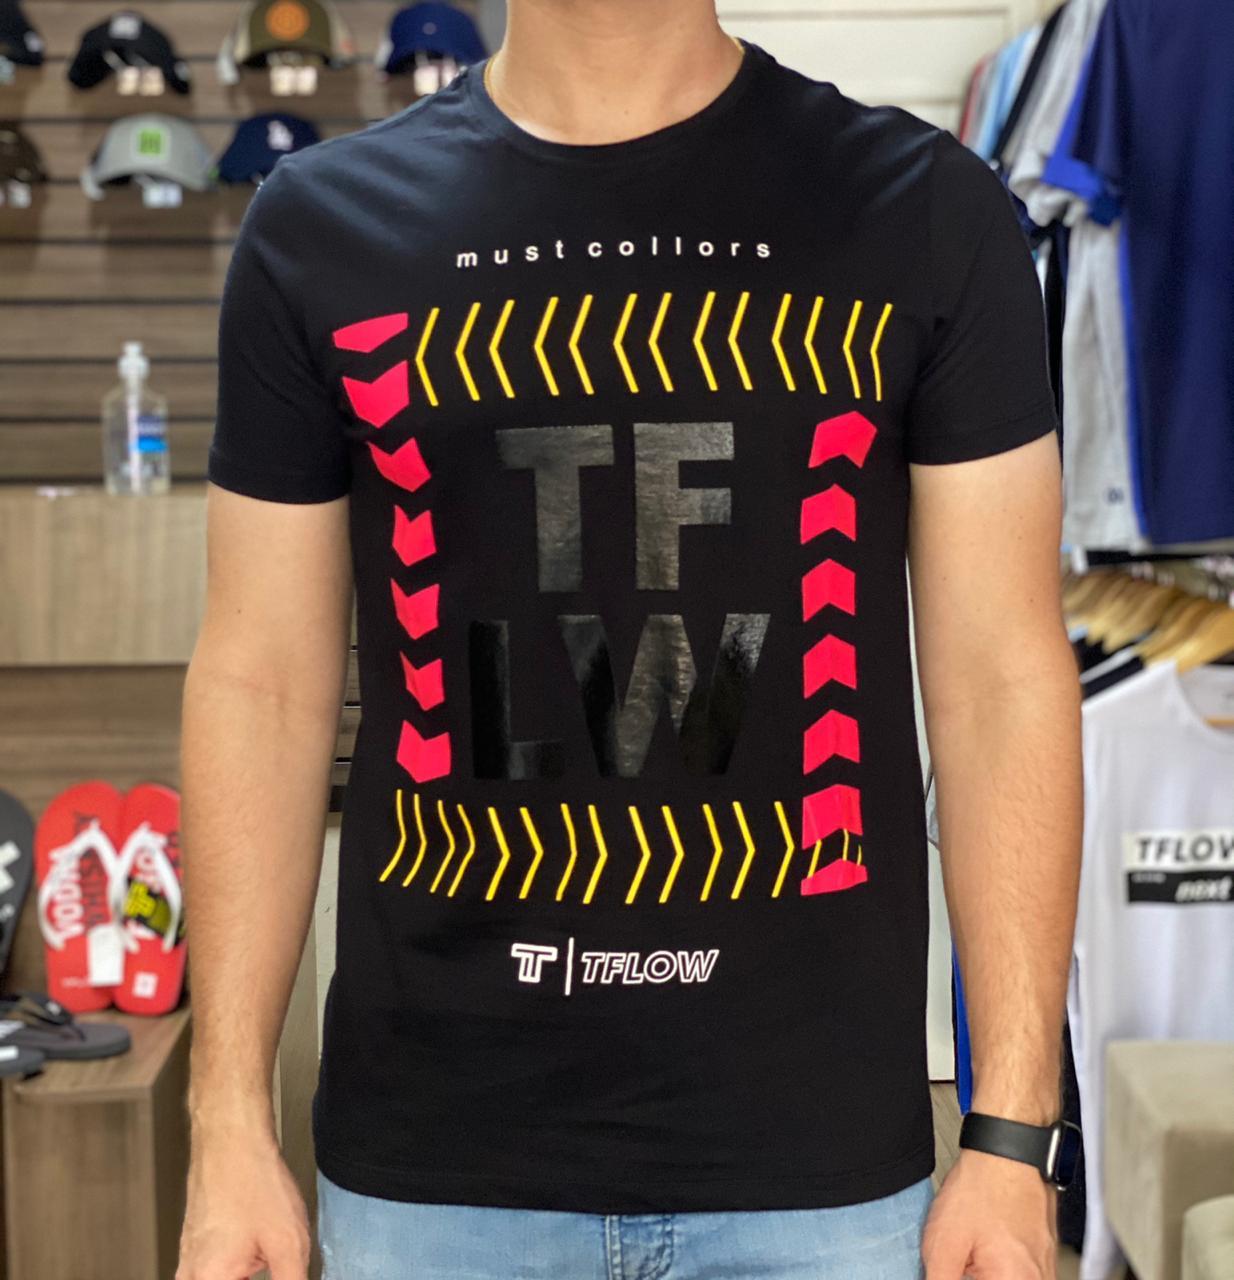 Camiseta Masculina Tflow Must Collors Geome Algodão Estampada - Branco